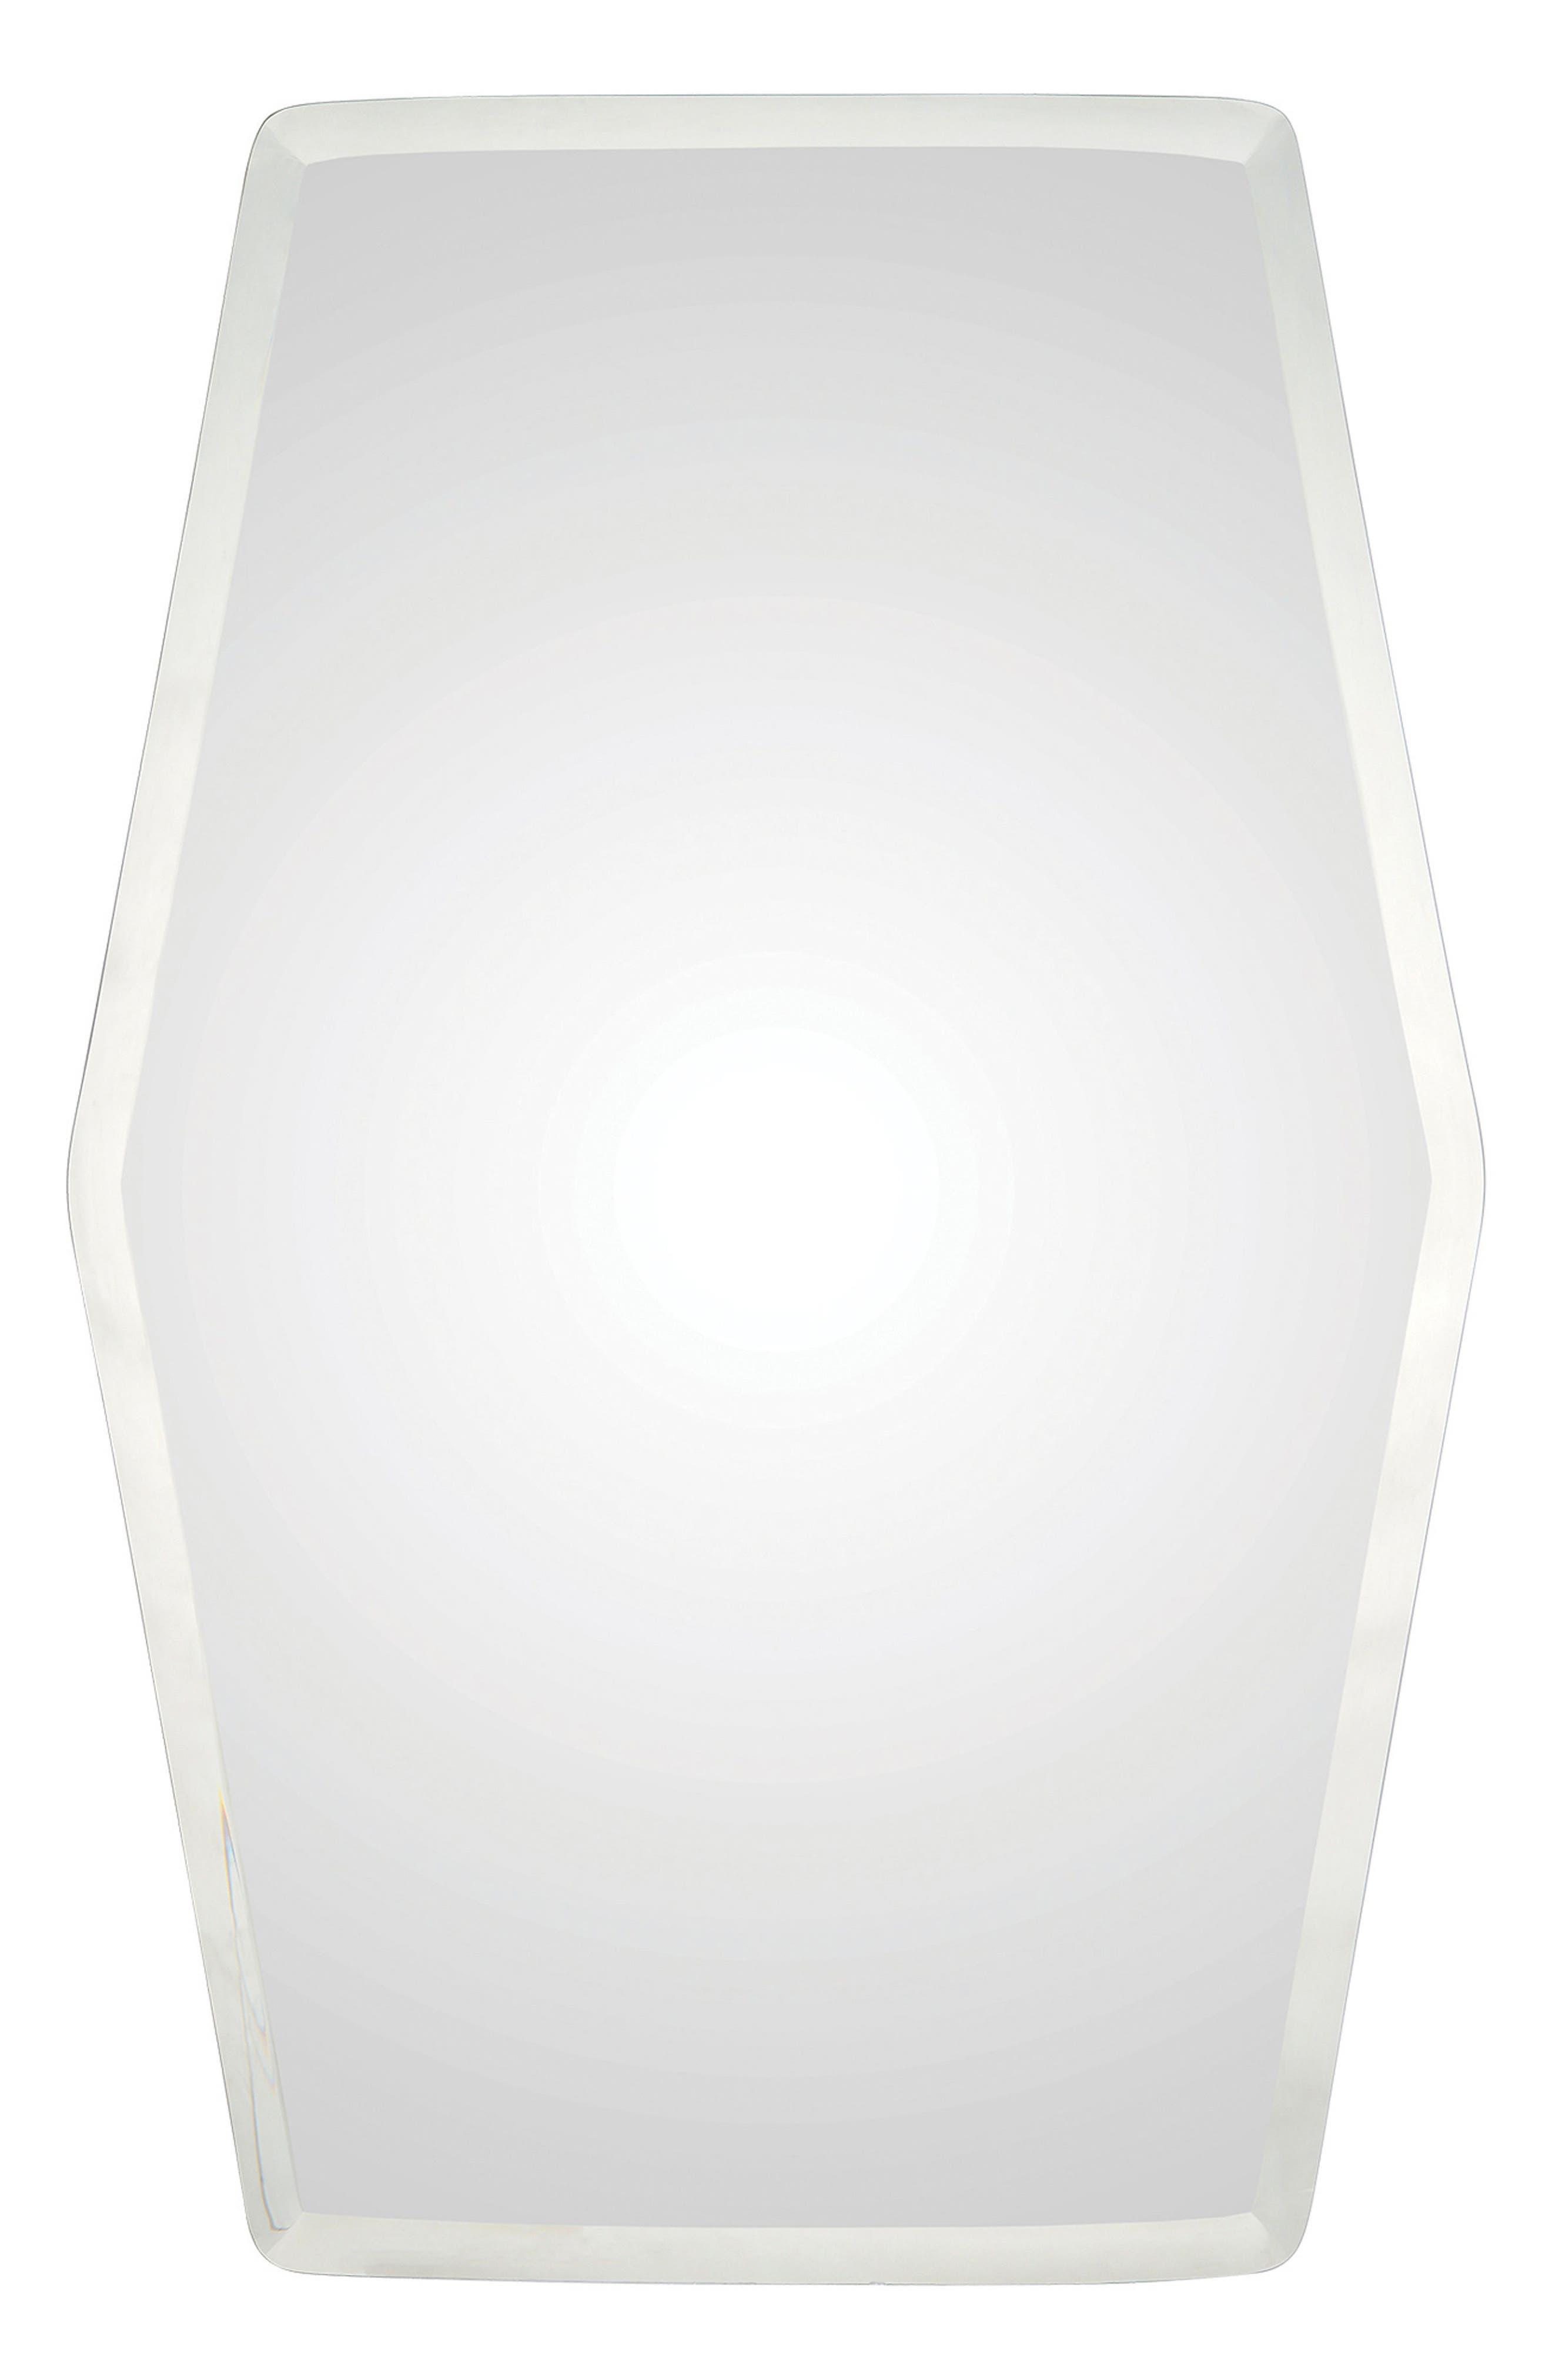 Main Image - Renwil Tel Aviv Mirror